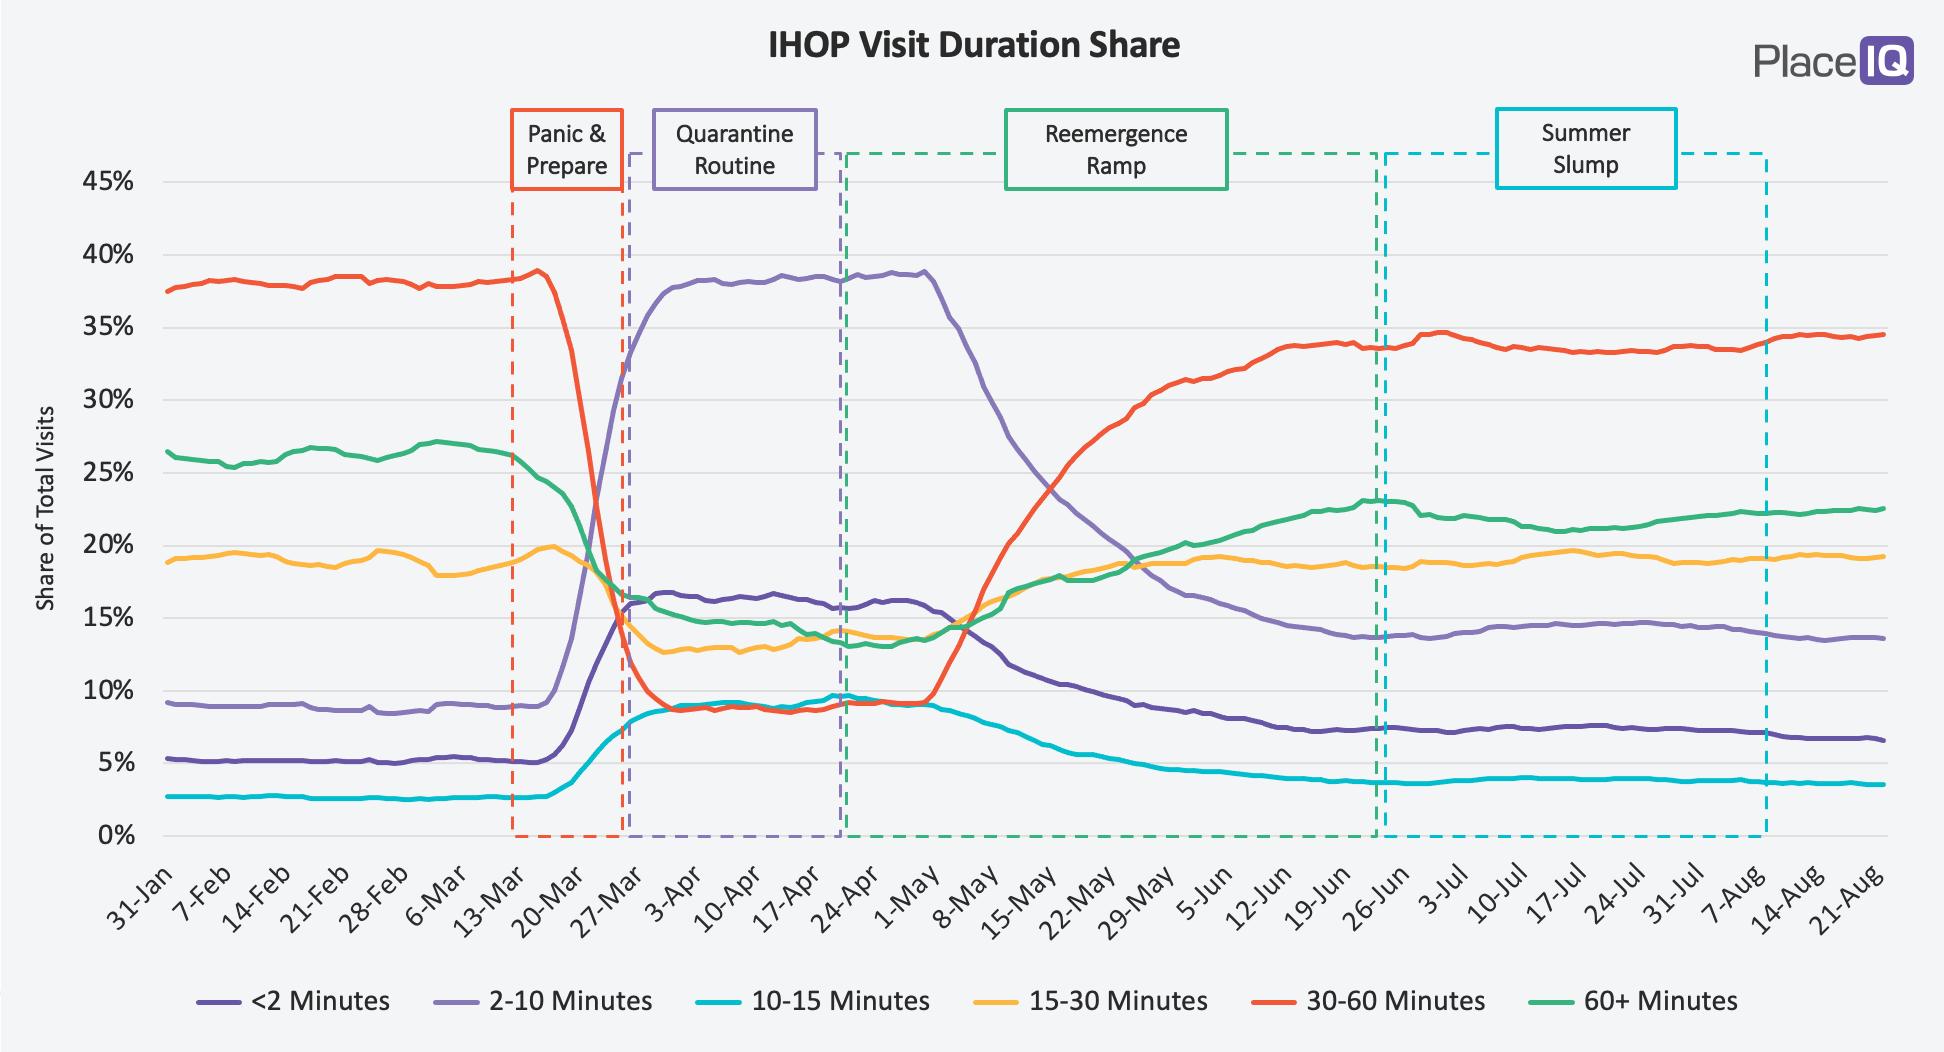 CHART: IHOP Visit Duration Share